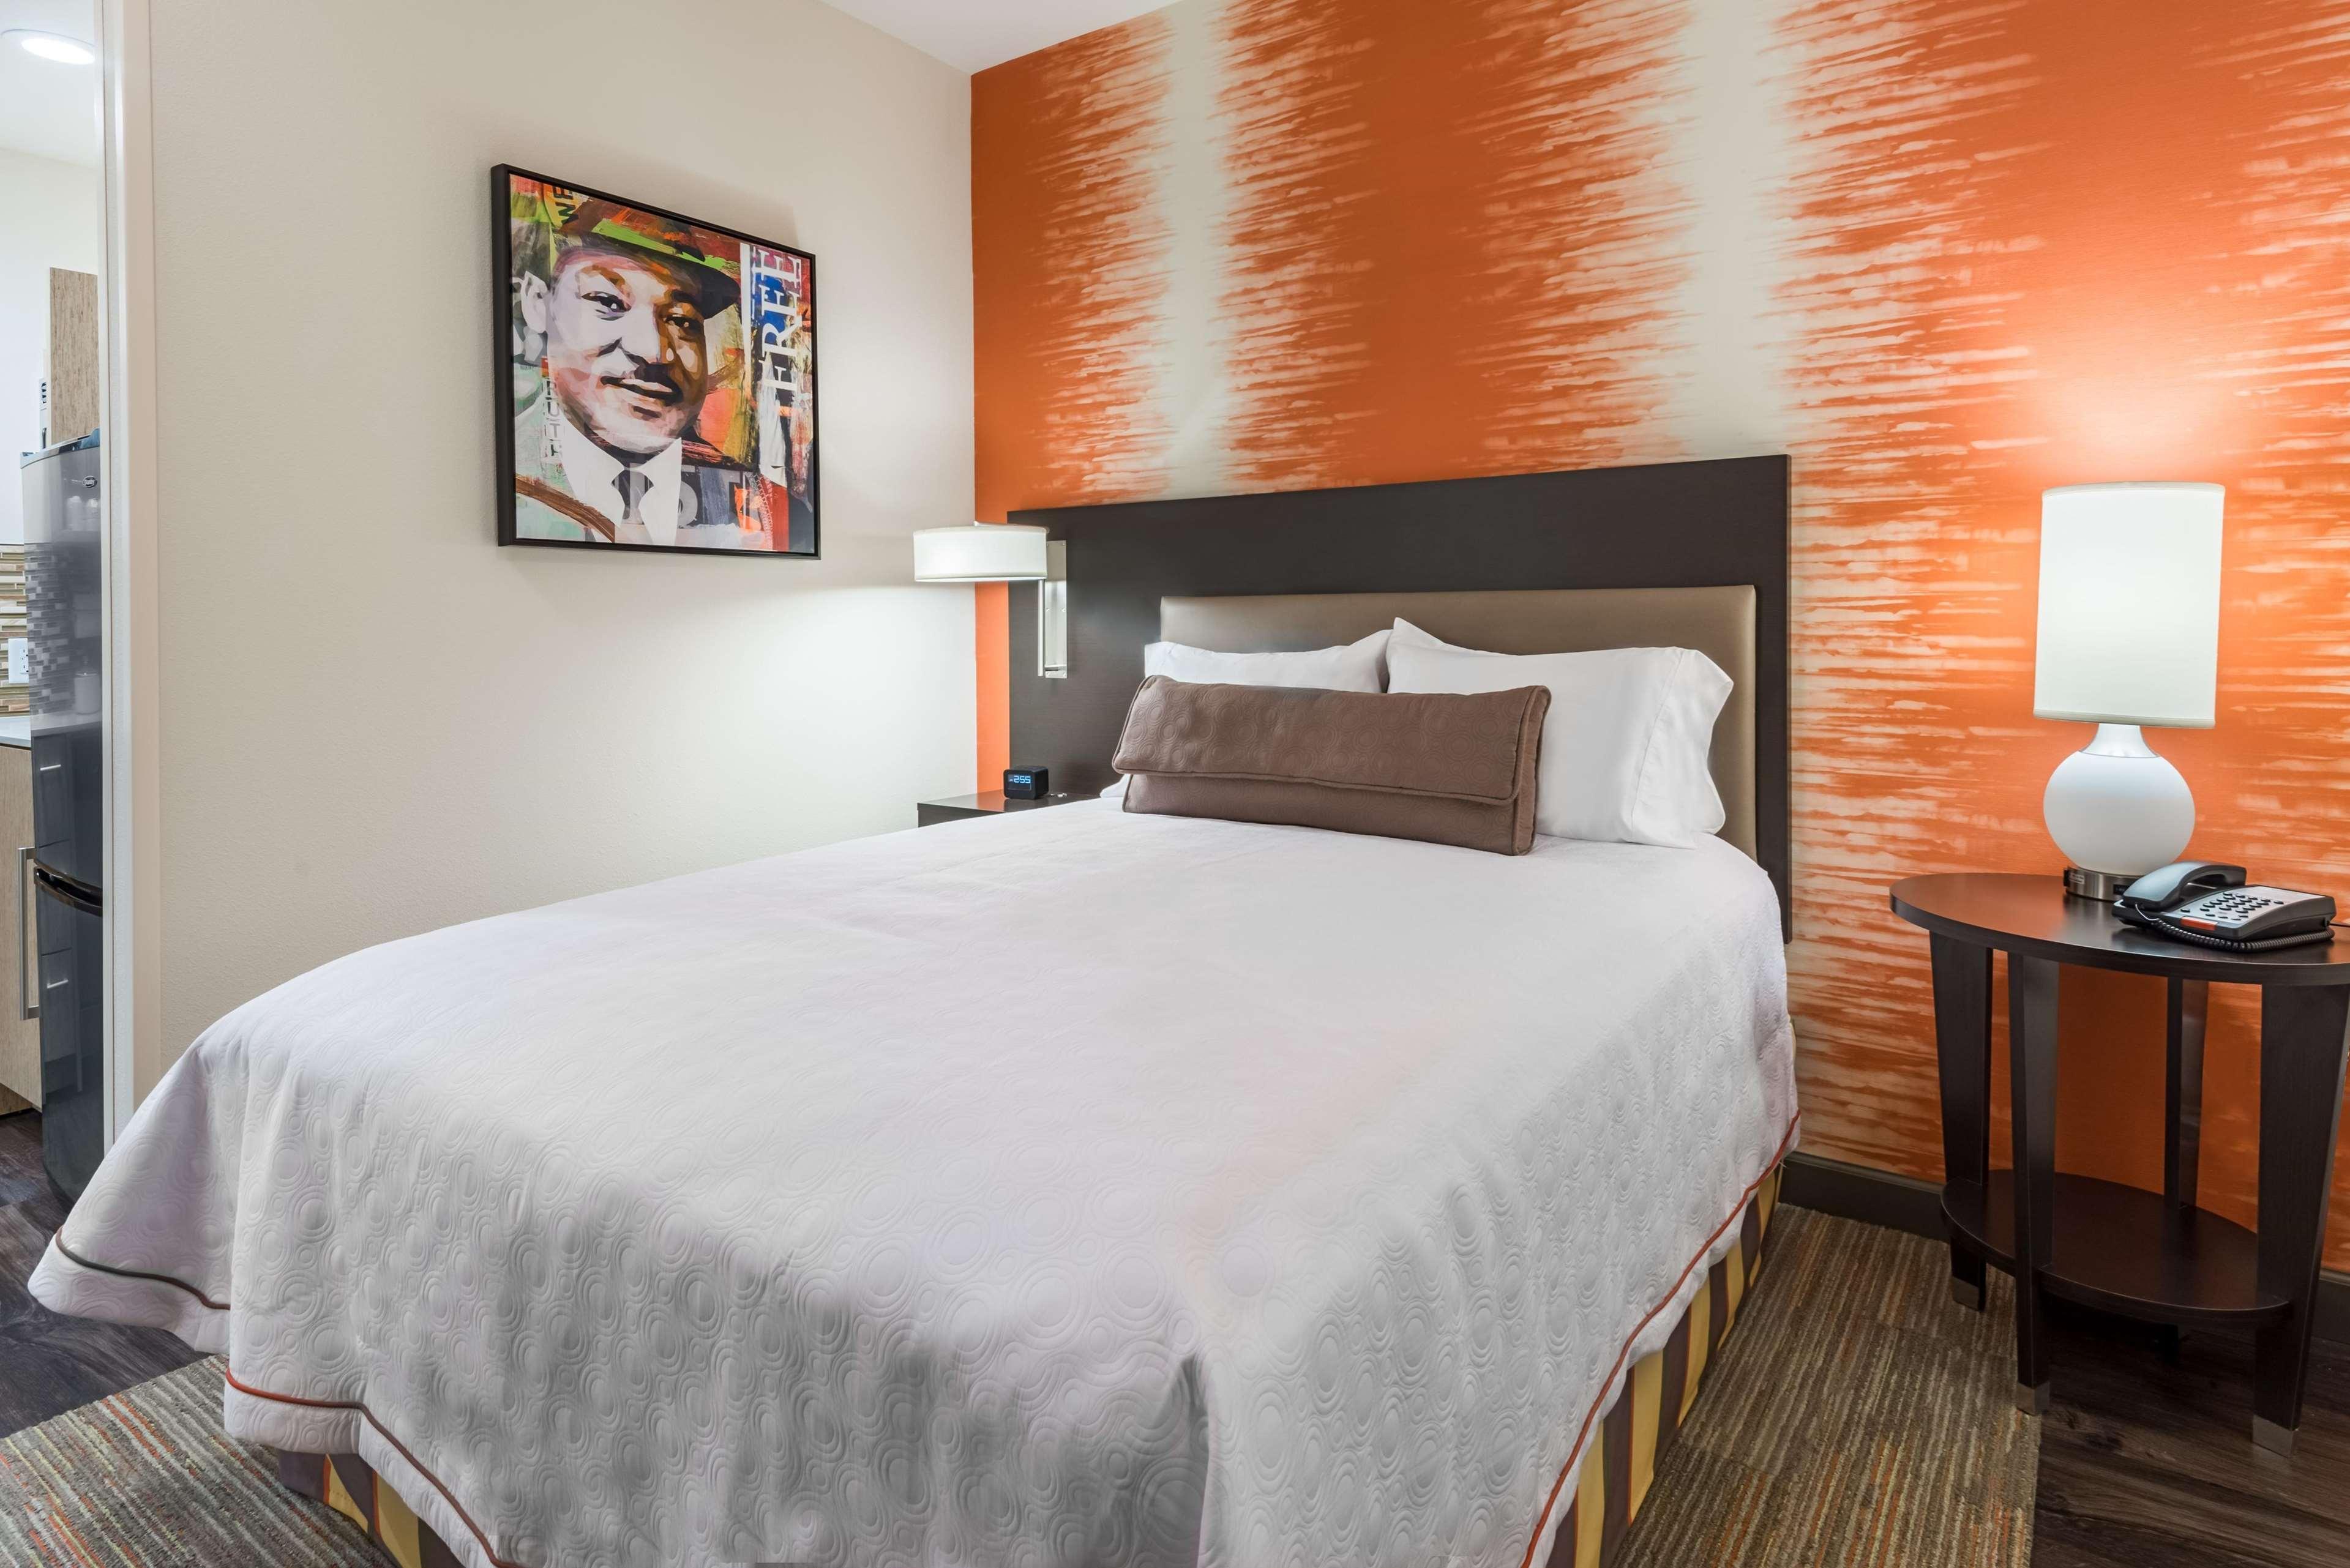 Home2 Suites by Hilton Atlanta Downtown image 21